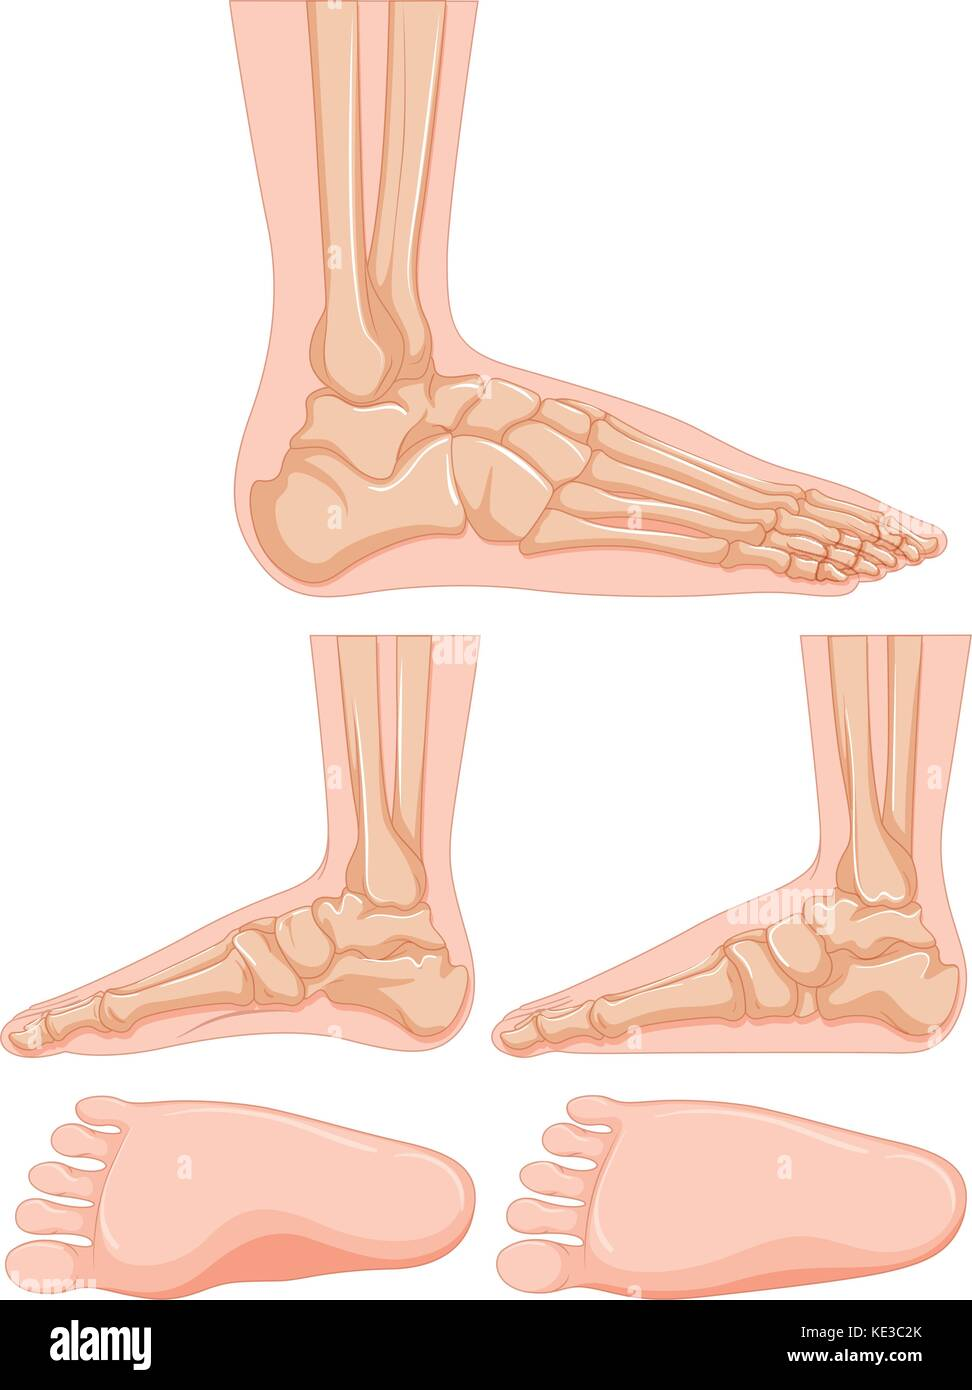 hight resolution of diagram of human foot bone illustration